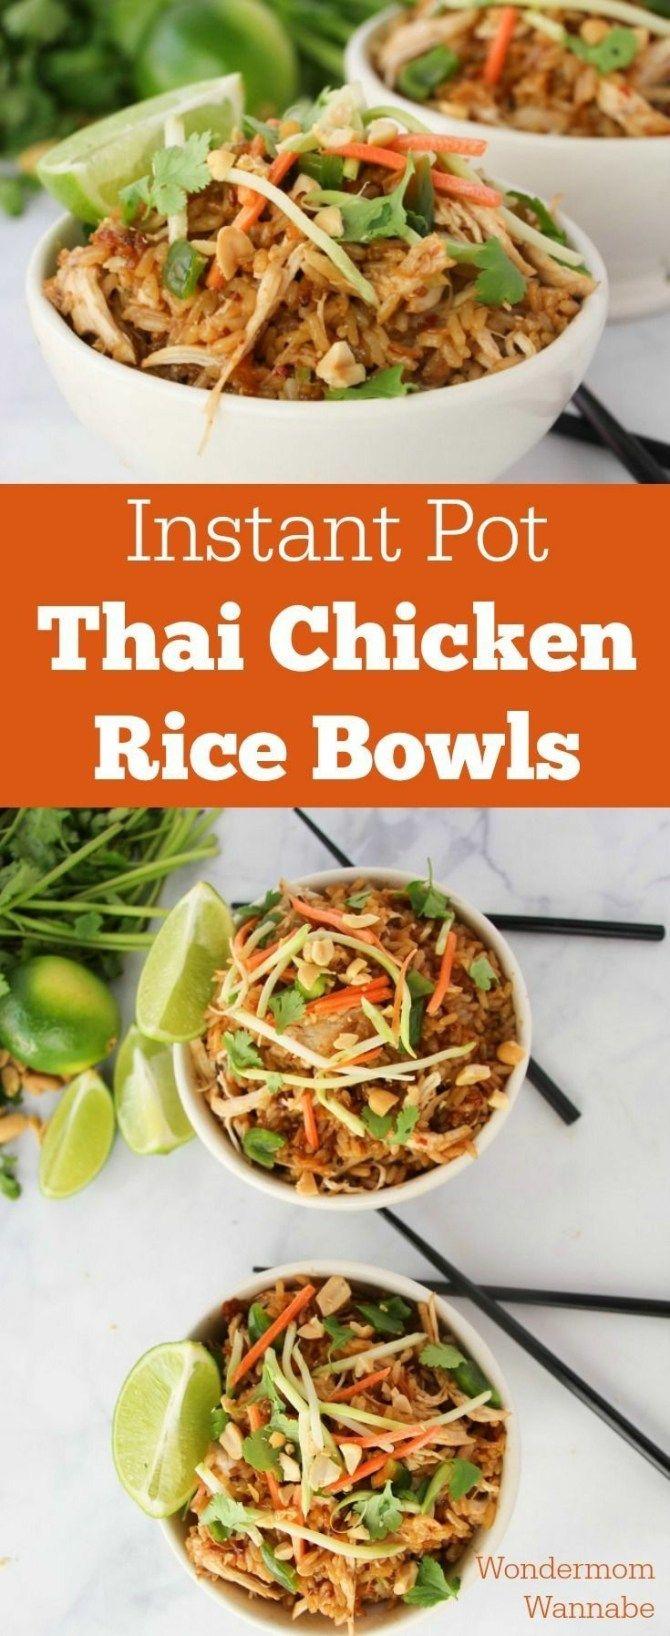 31 Chicken Instant Pot Recipes: Easy and Healthy #instantpotrecipeseasy